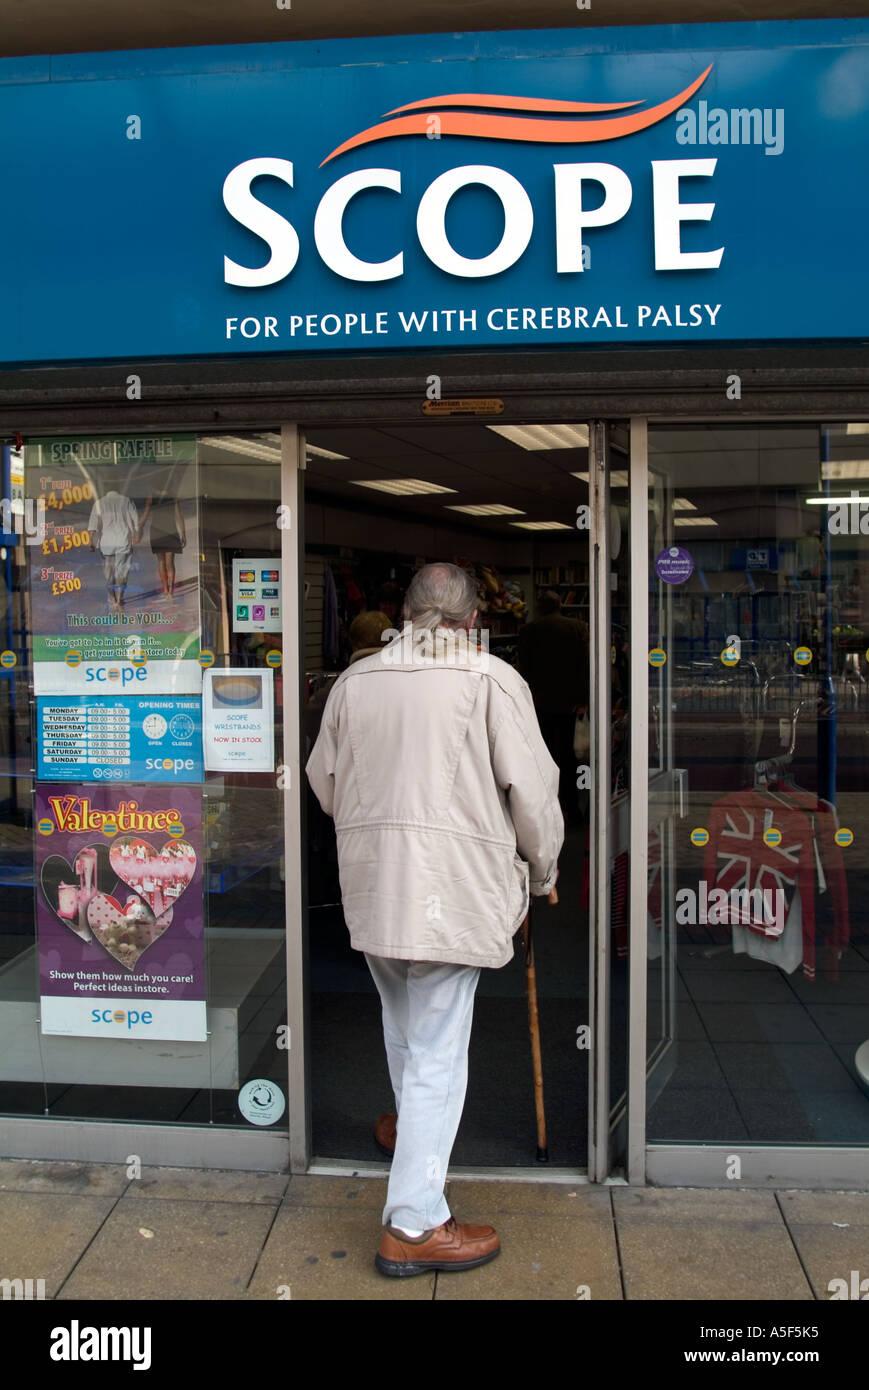 Facade of Scope charity shop Blackburn, Lancashire, UK - Stock Image